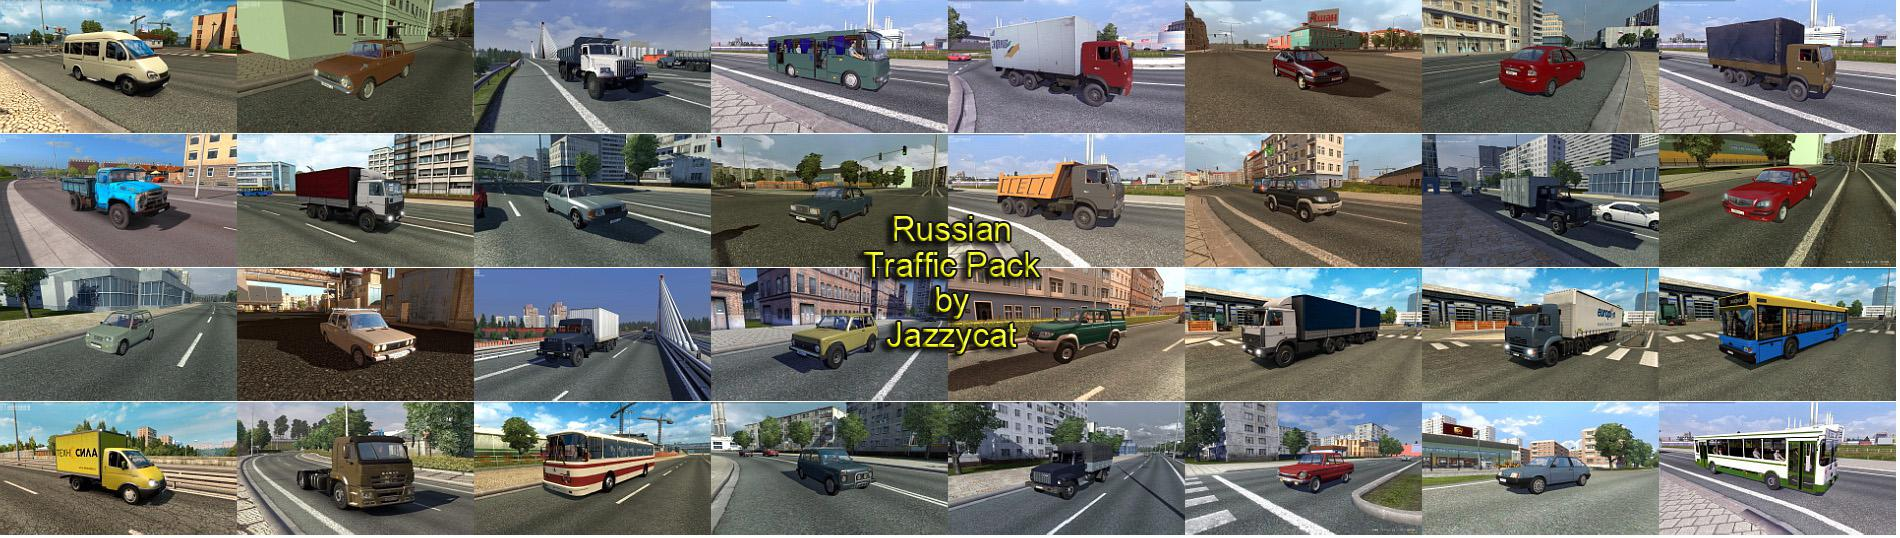 ETS2 - Russian Traffic Pack V2.6 (1.35.X)